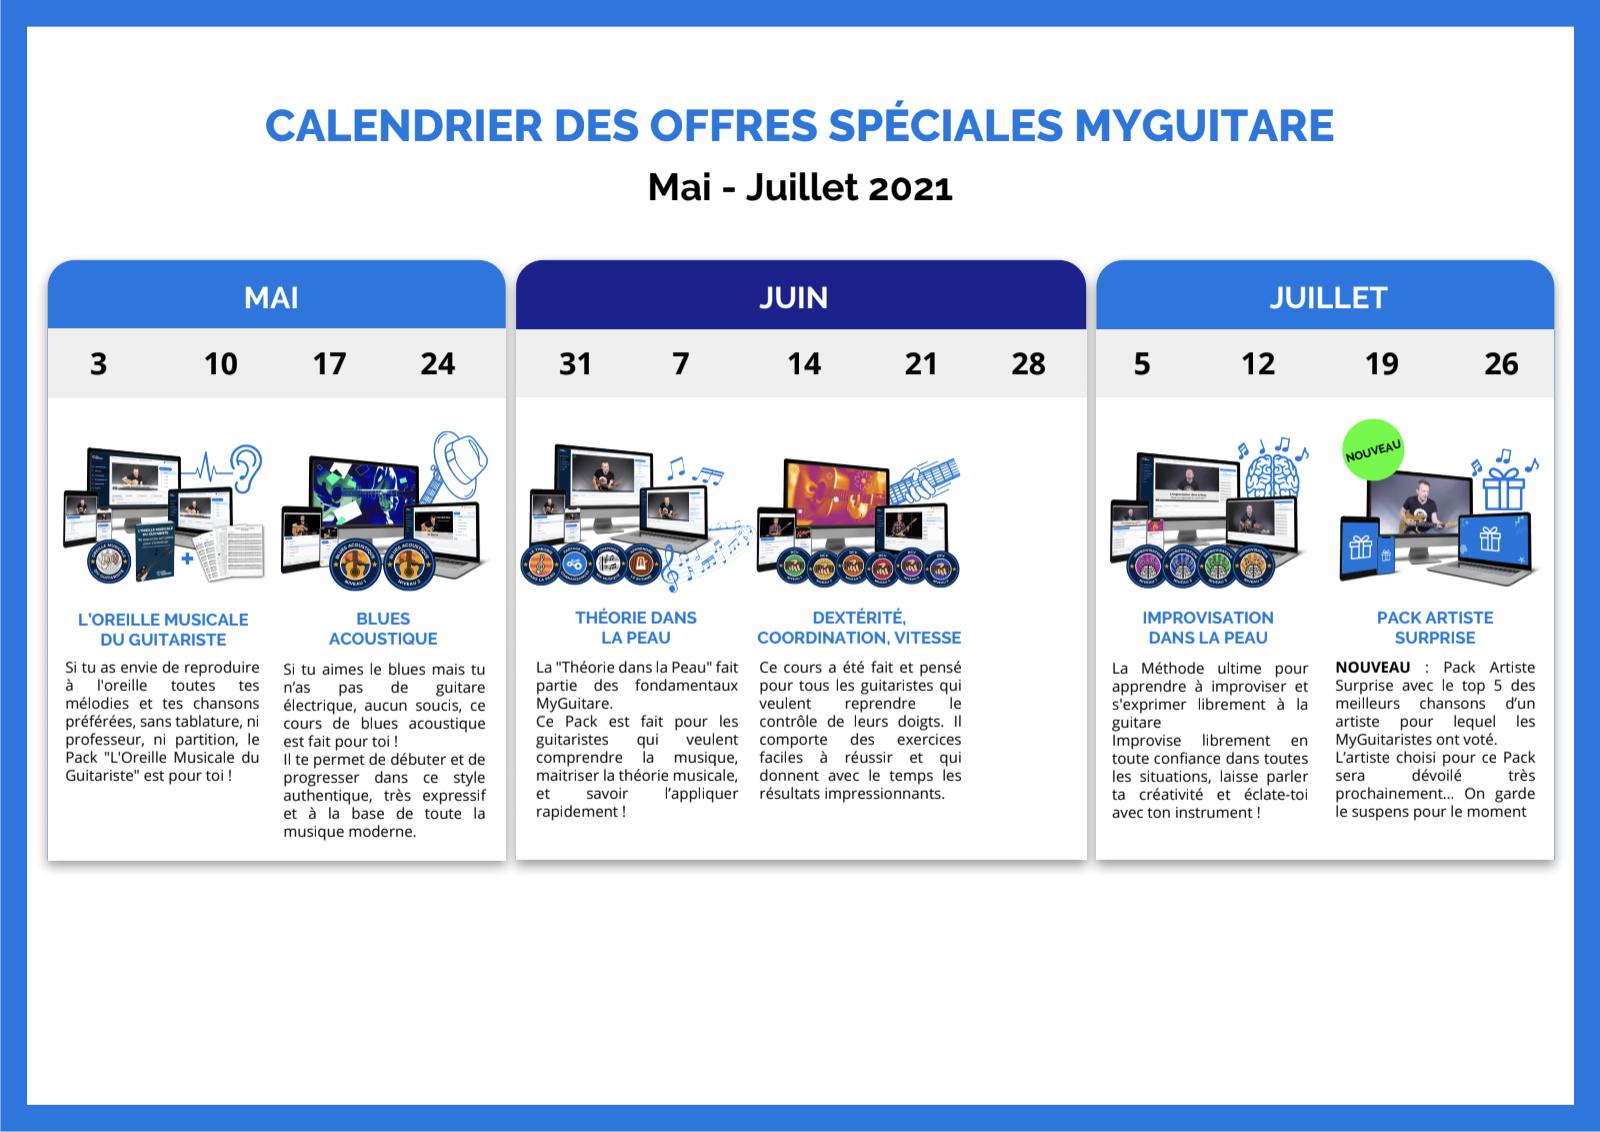 calendrier offres speciales mai juillet 2021 myguitare